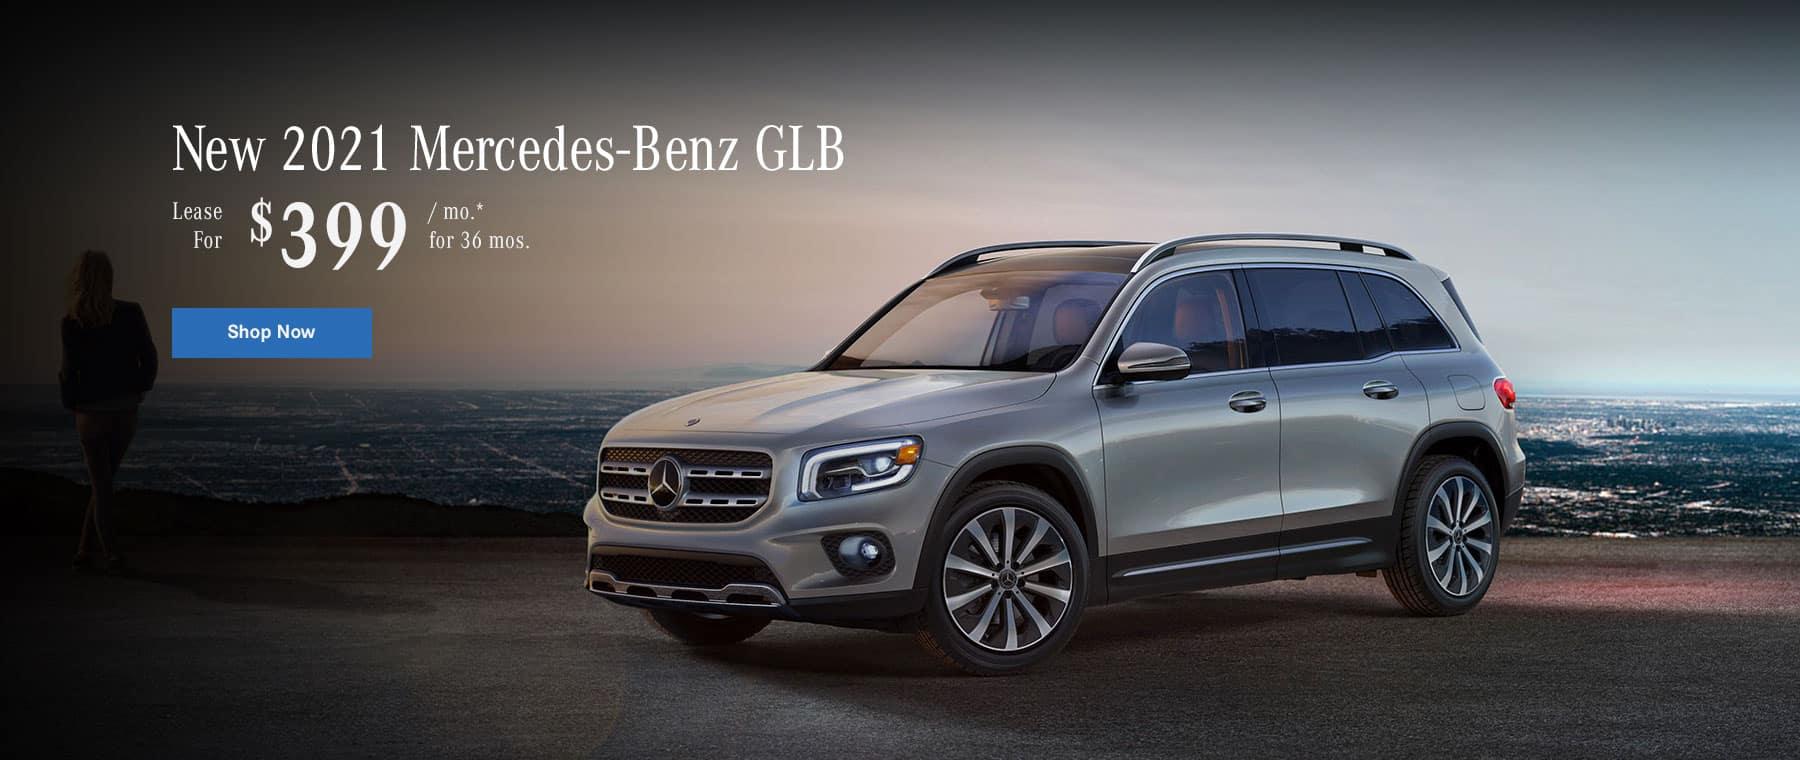 New 2021 Mercedes-Benz GLB